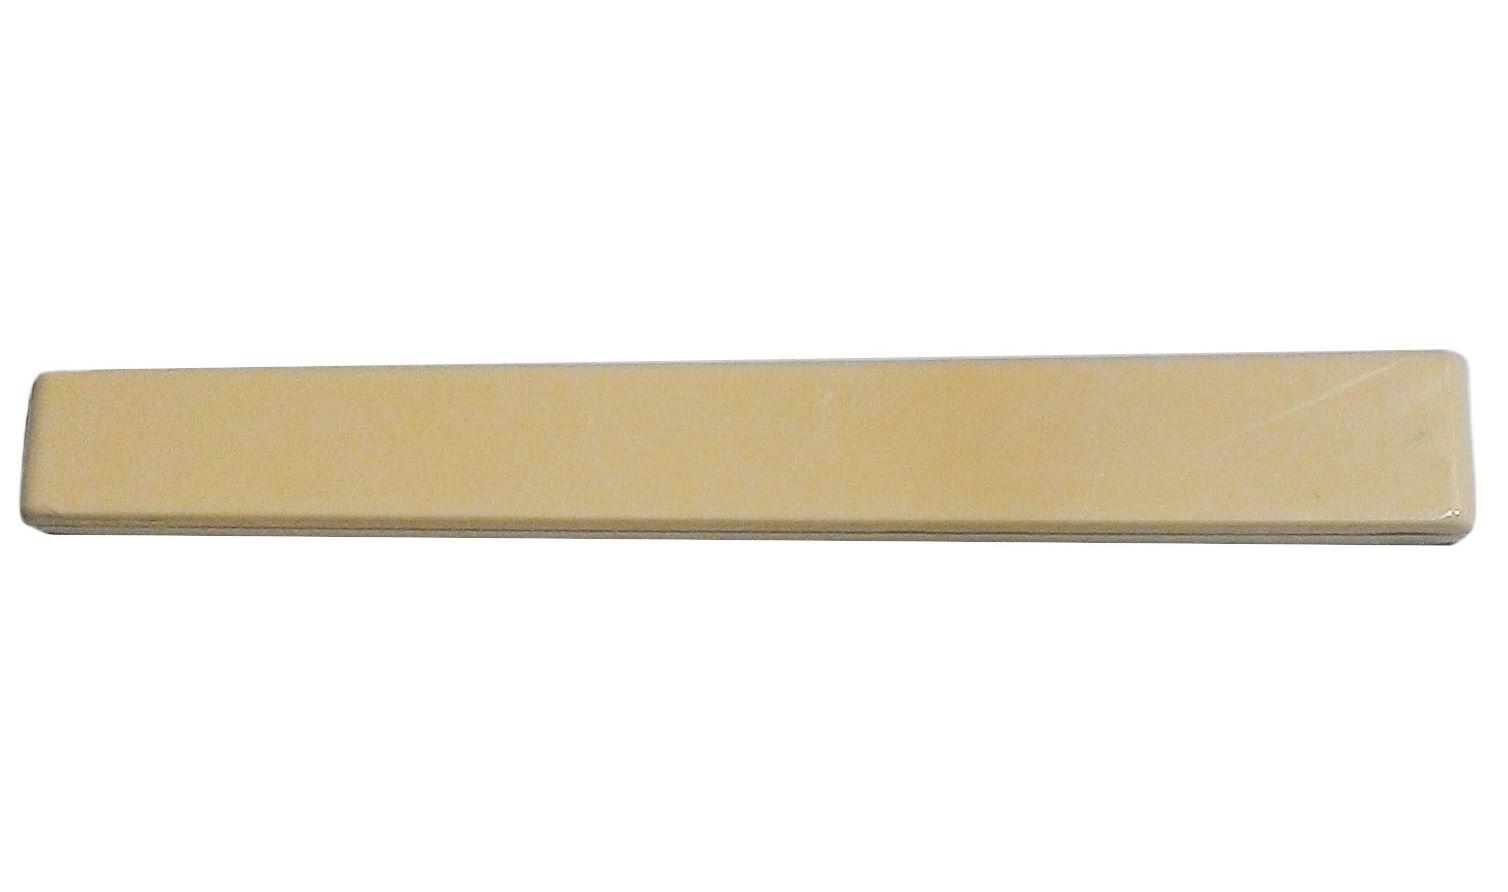 Rastilho de plástico cor marfim para violão clássico (3mm x 11.3/9.3mm x 80mm) - Alice (A027FH)  - Luthieria Brasil